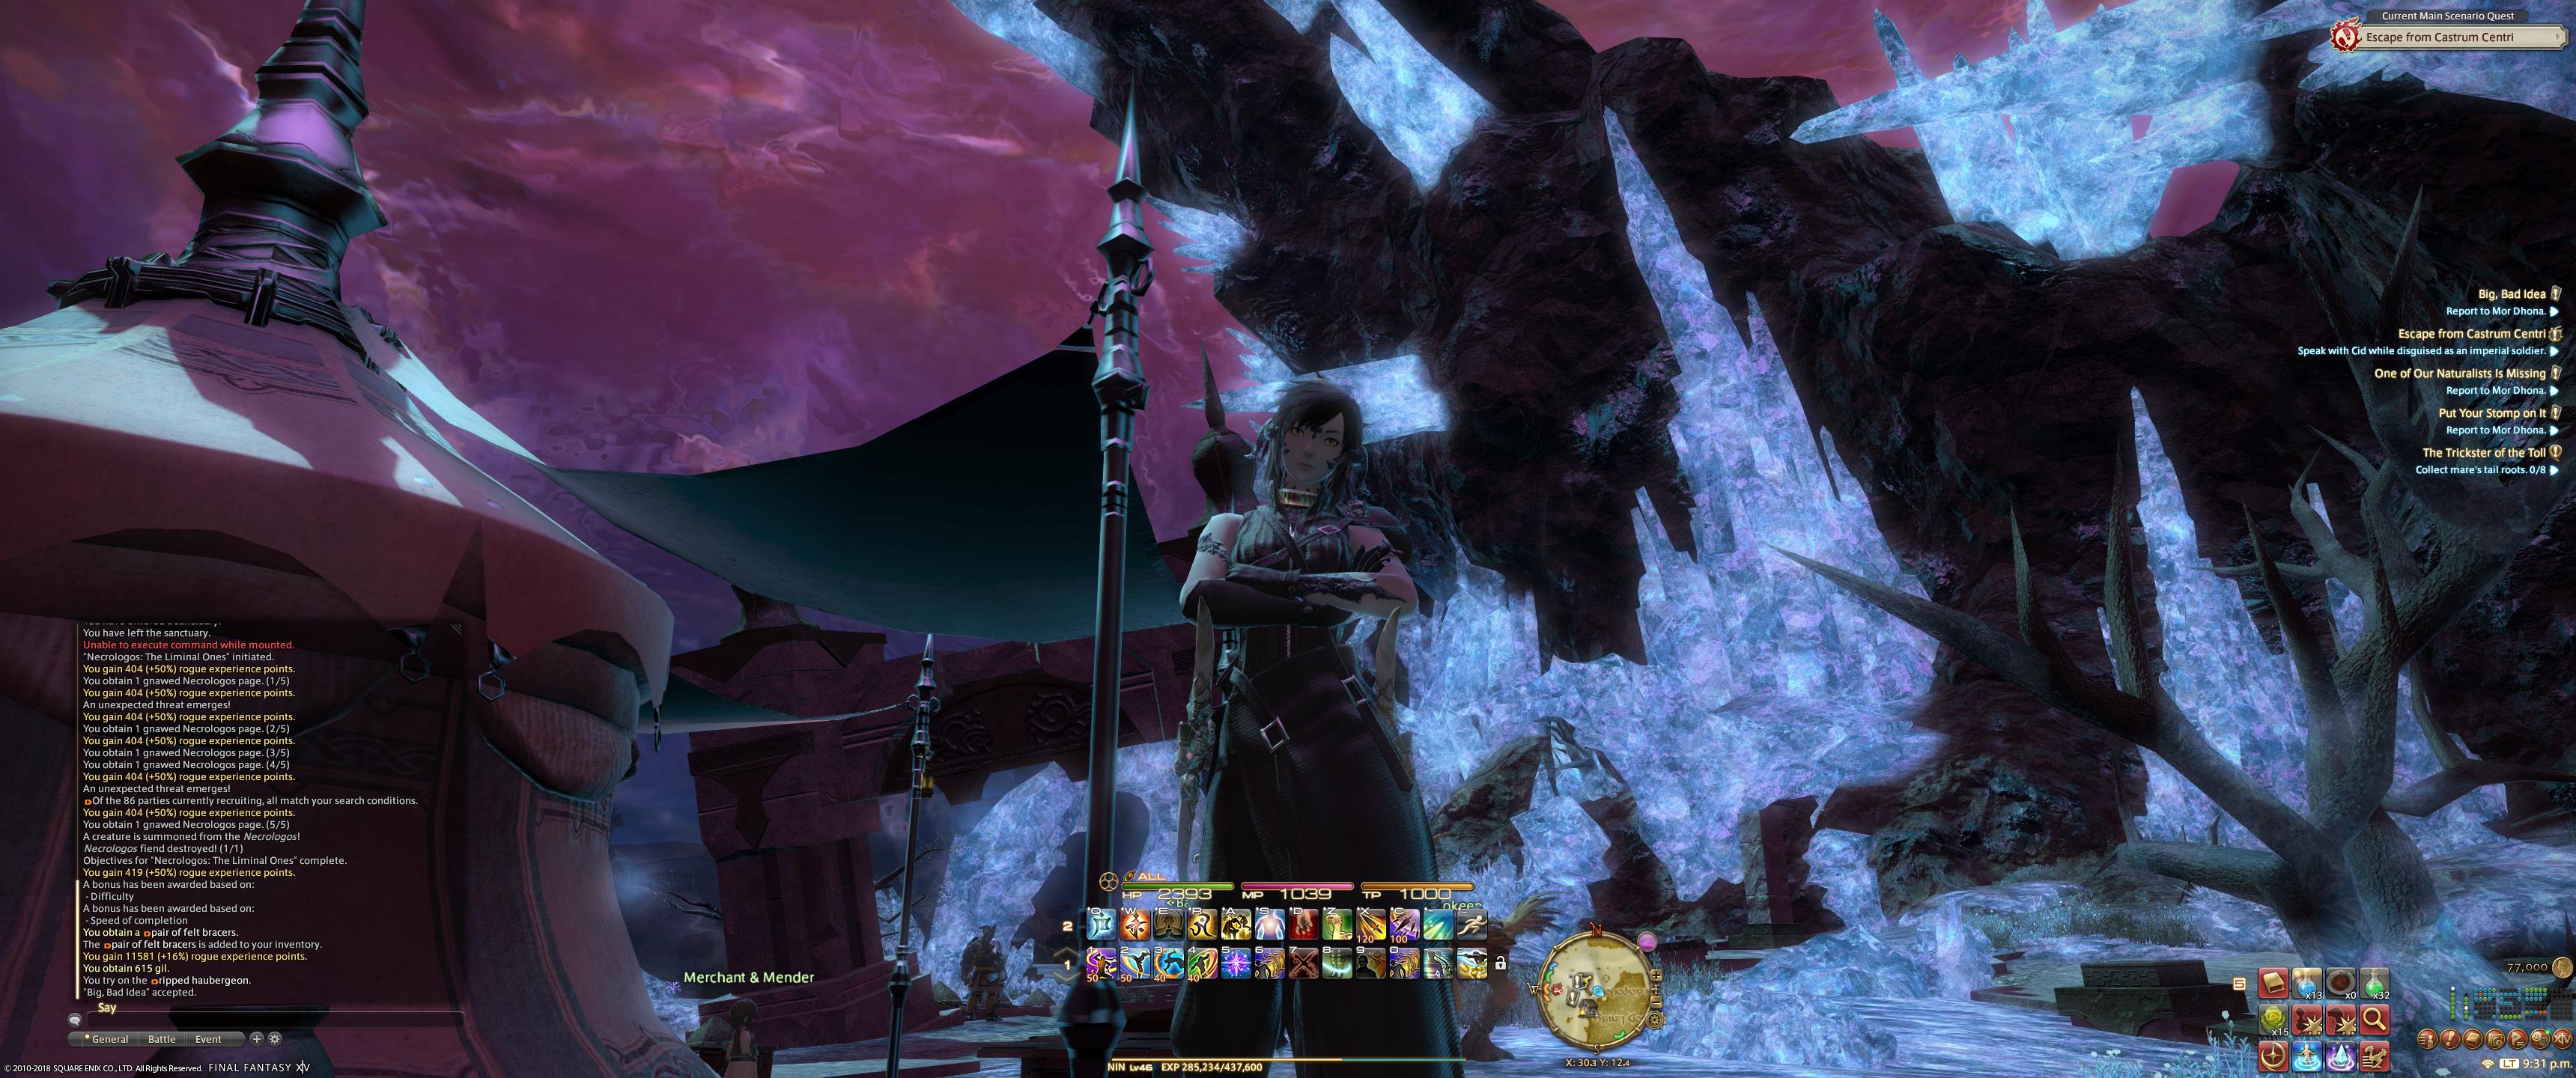 FFXIV Ninja/Samurai ScreenShots – QuestForEternity